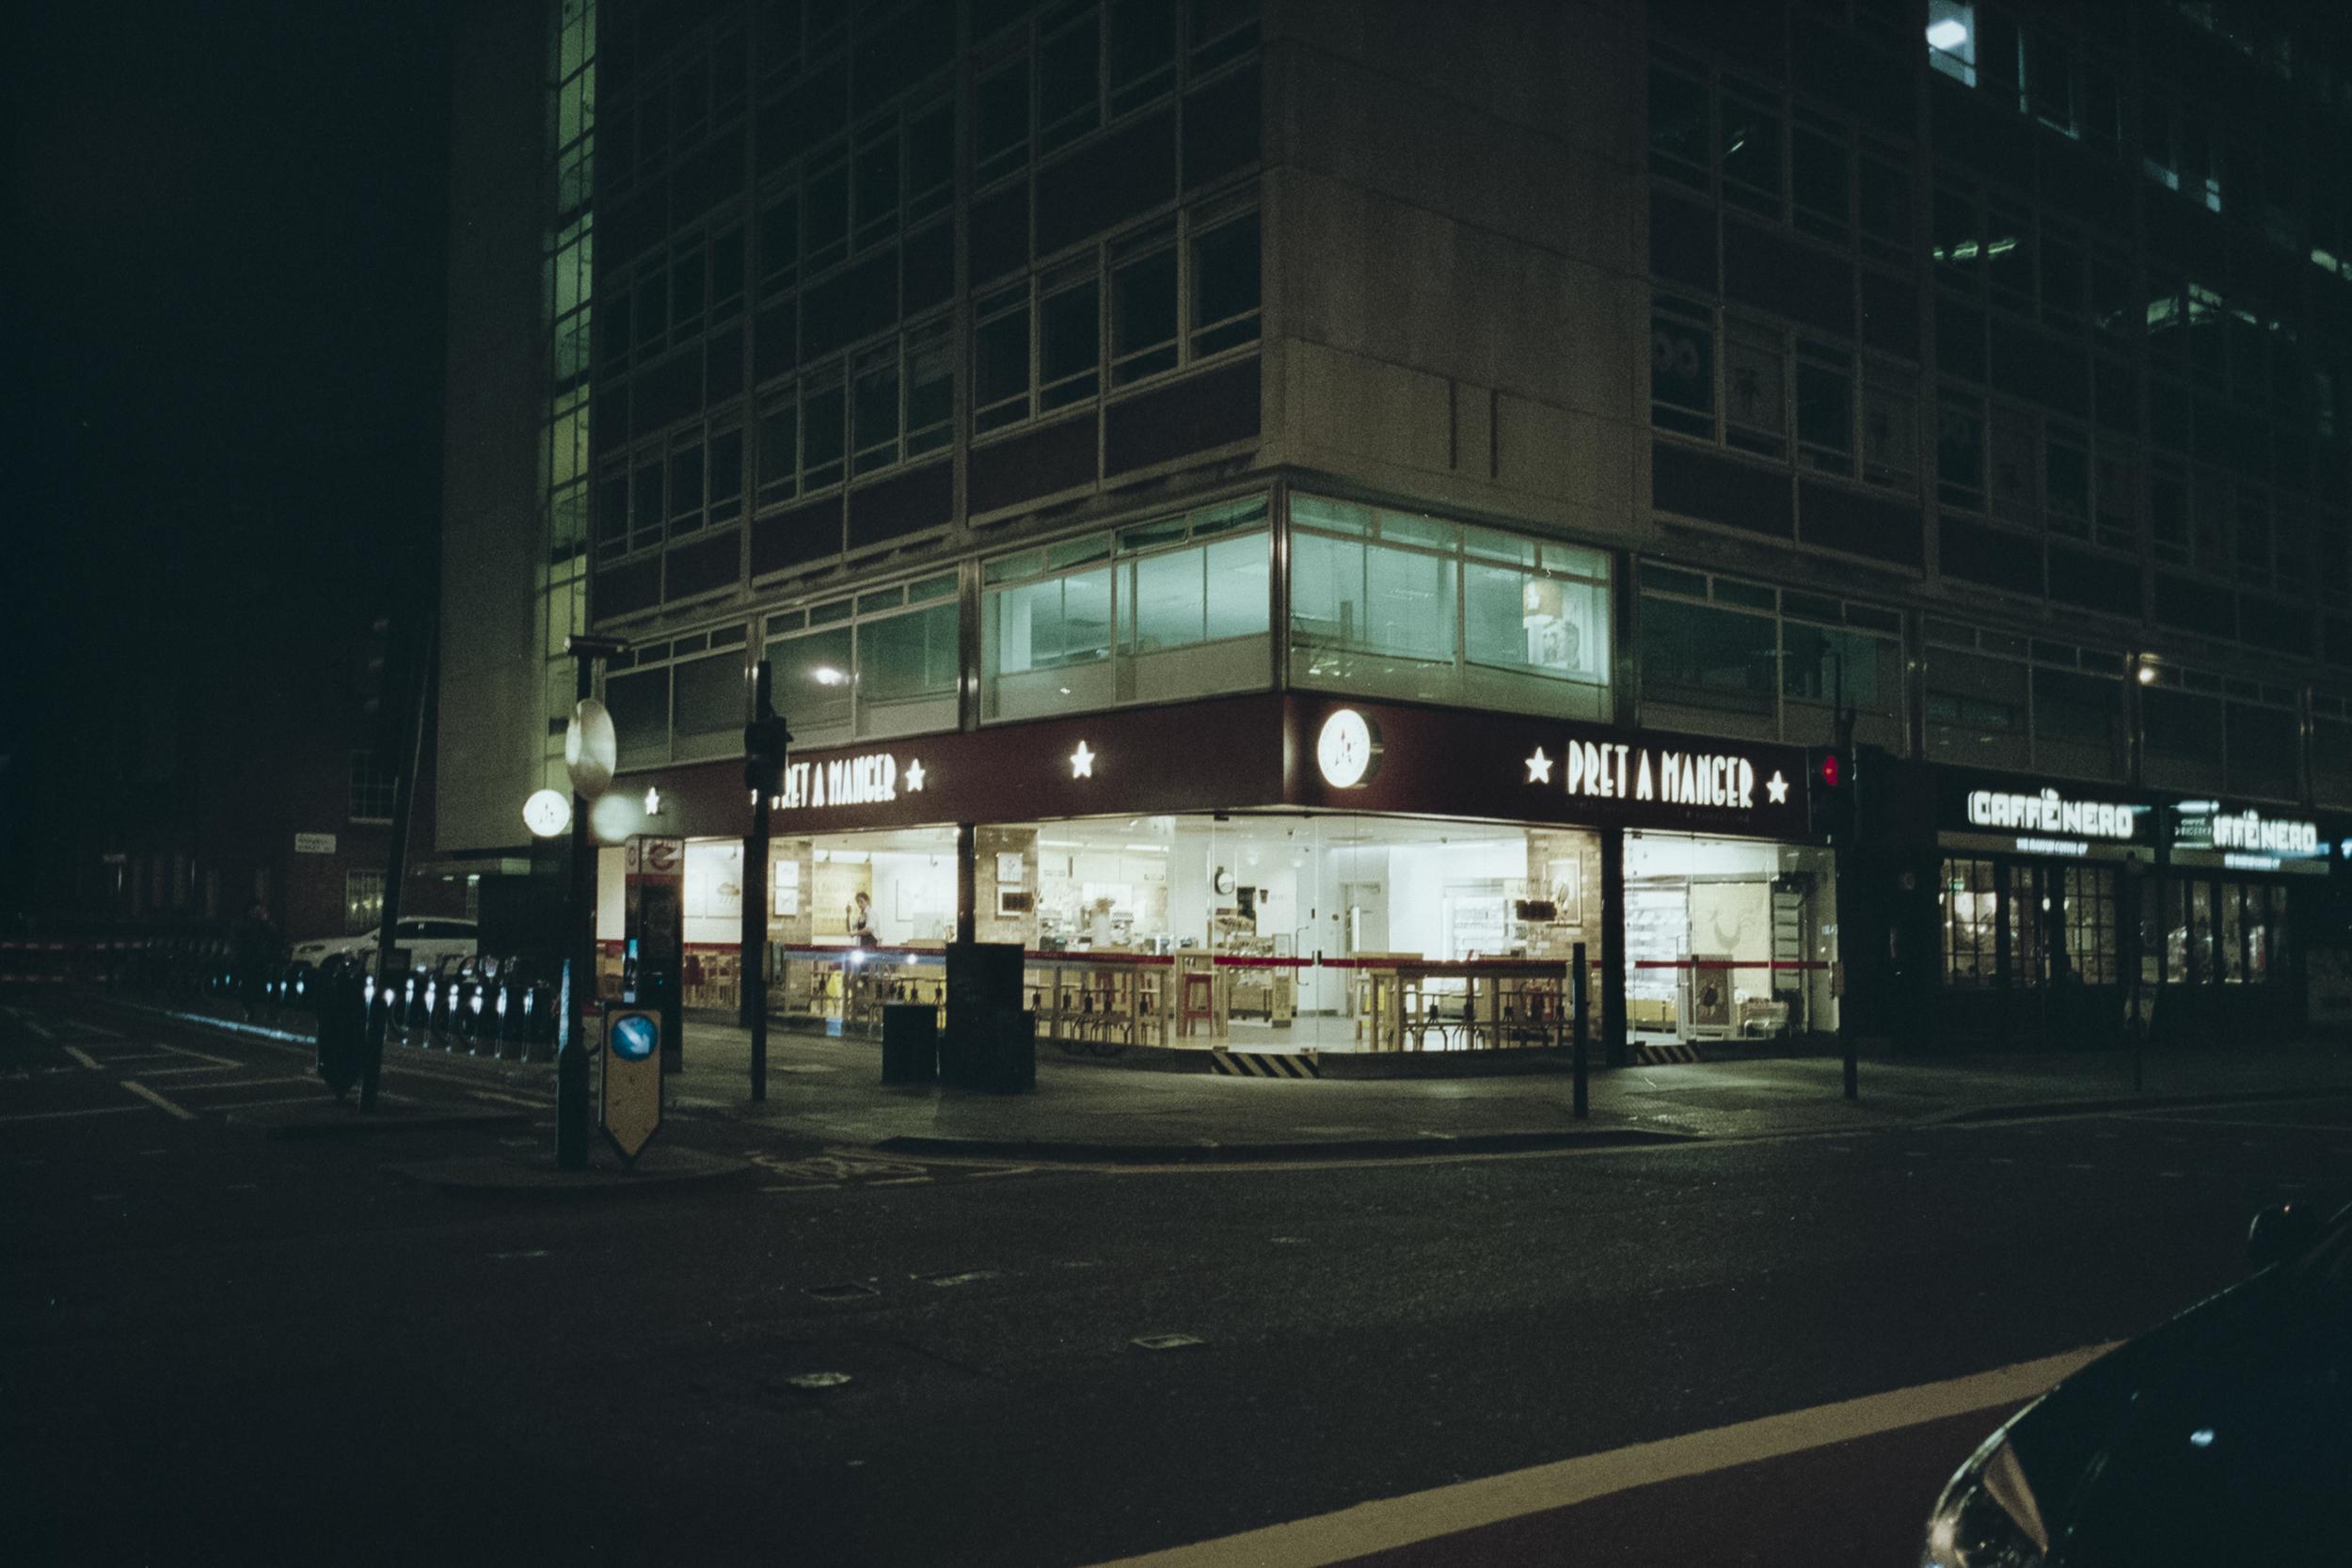 Oscar-arribas-photography-fotografo-portrait-retrato-editorial-london-street-photography-urbana-londres-film-analog-35mm-night-nocturna-63.jpg